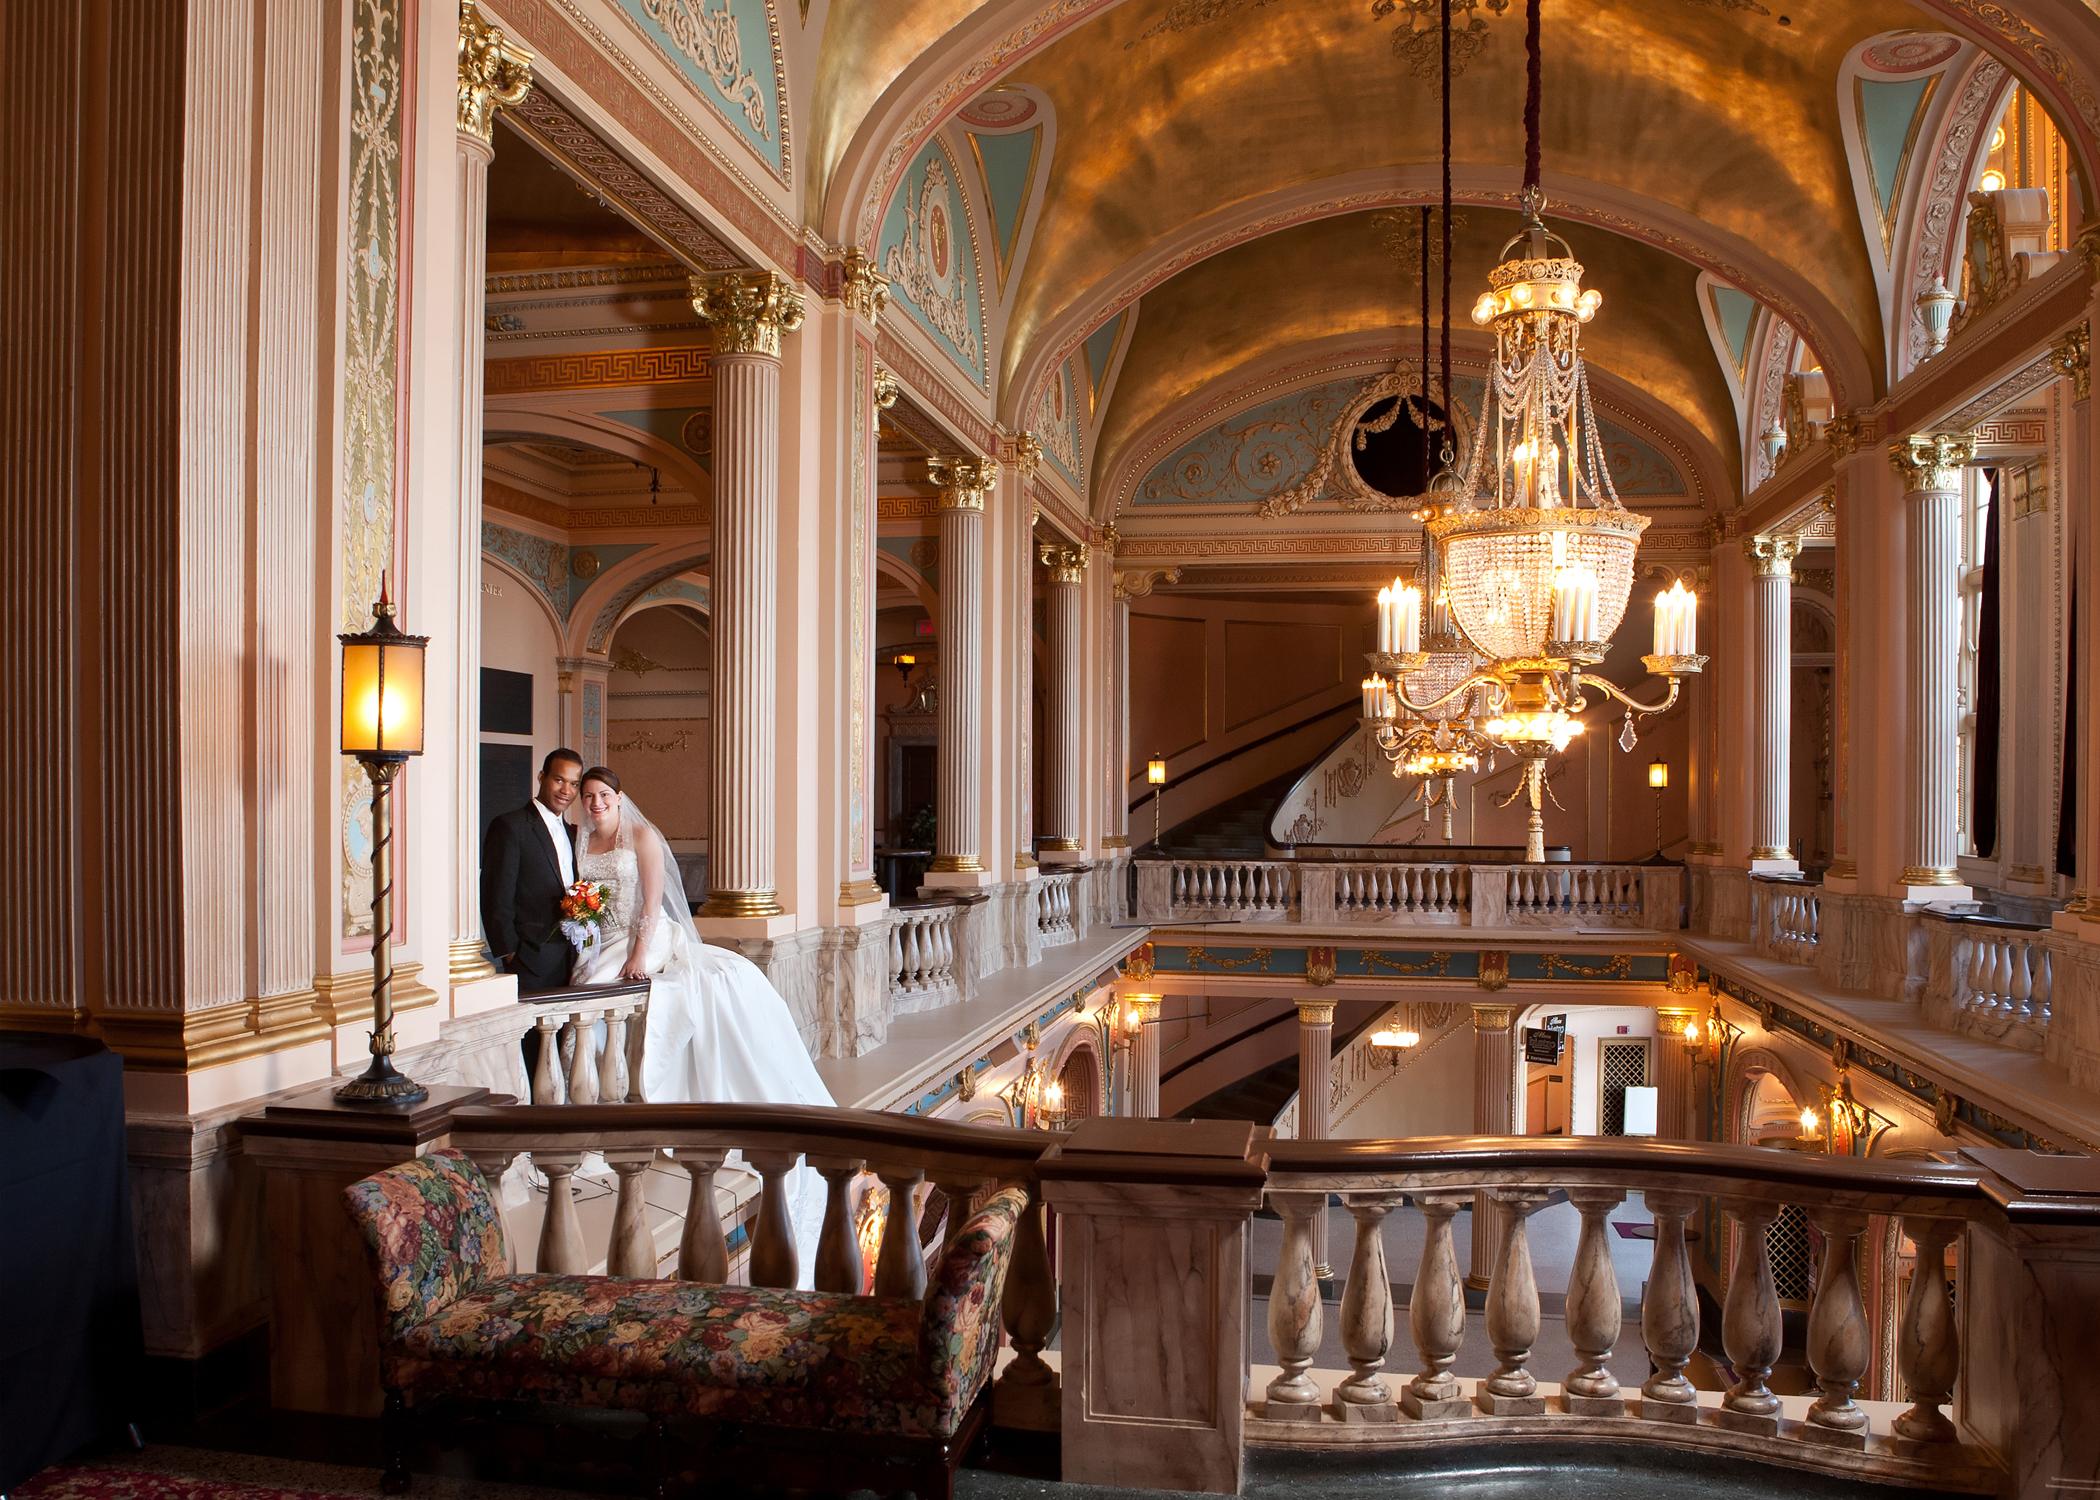 Wedding-Photography-Palaise-Royale-South-Bend-Indiana_20.jpg